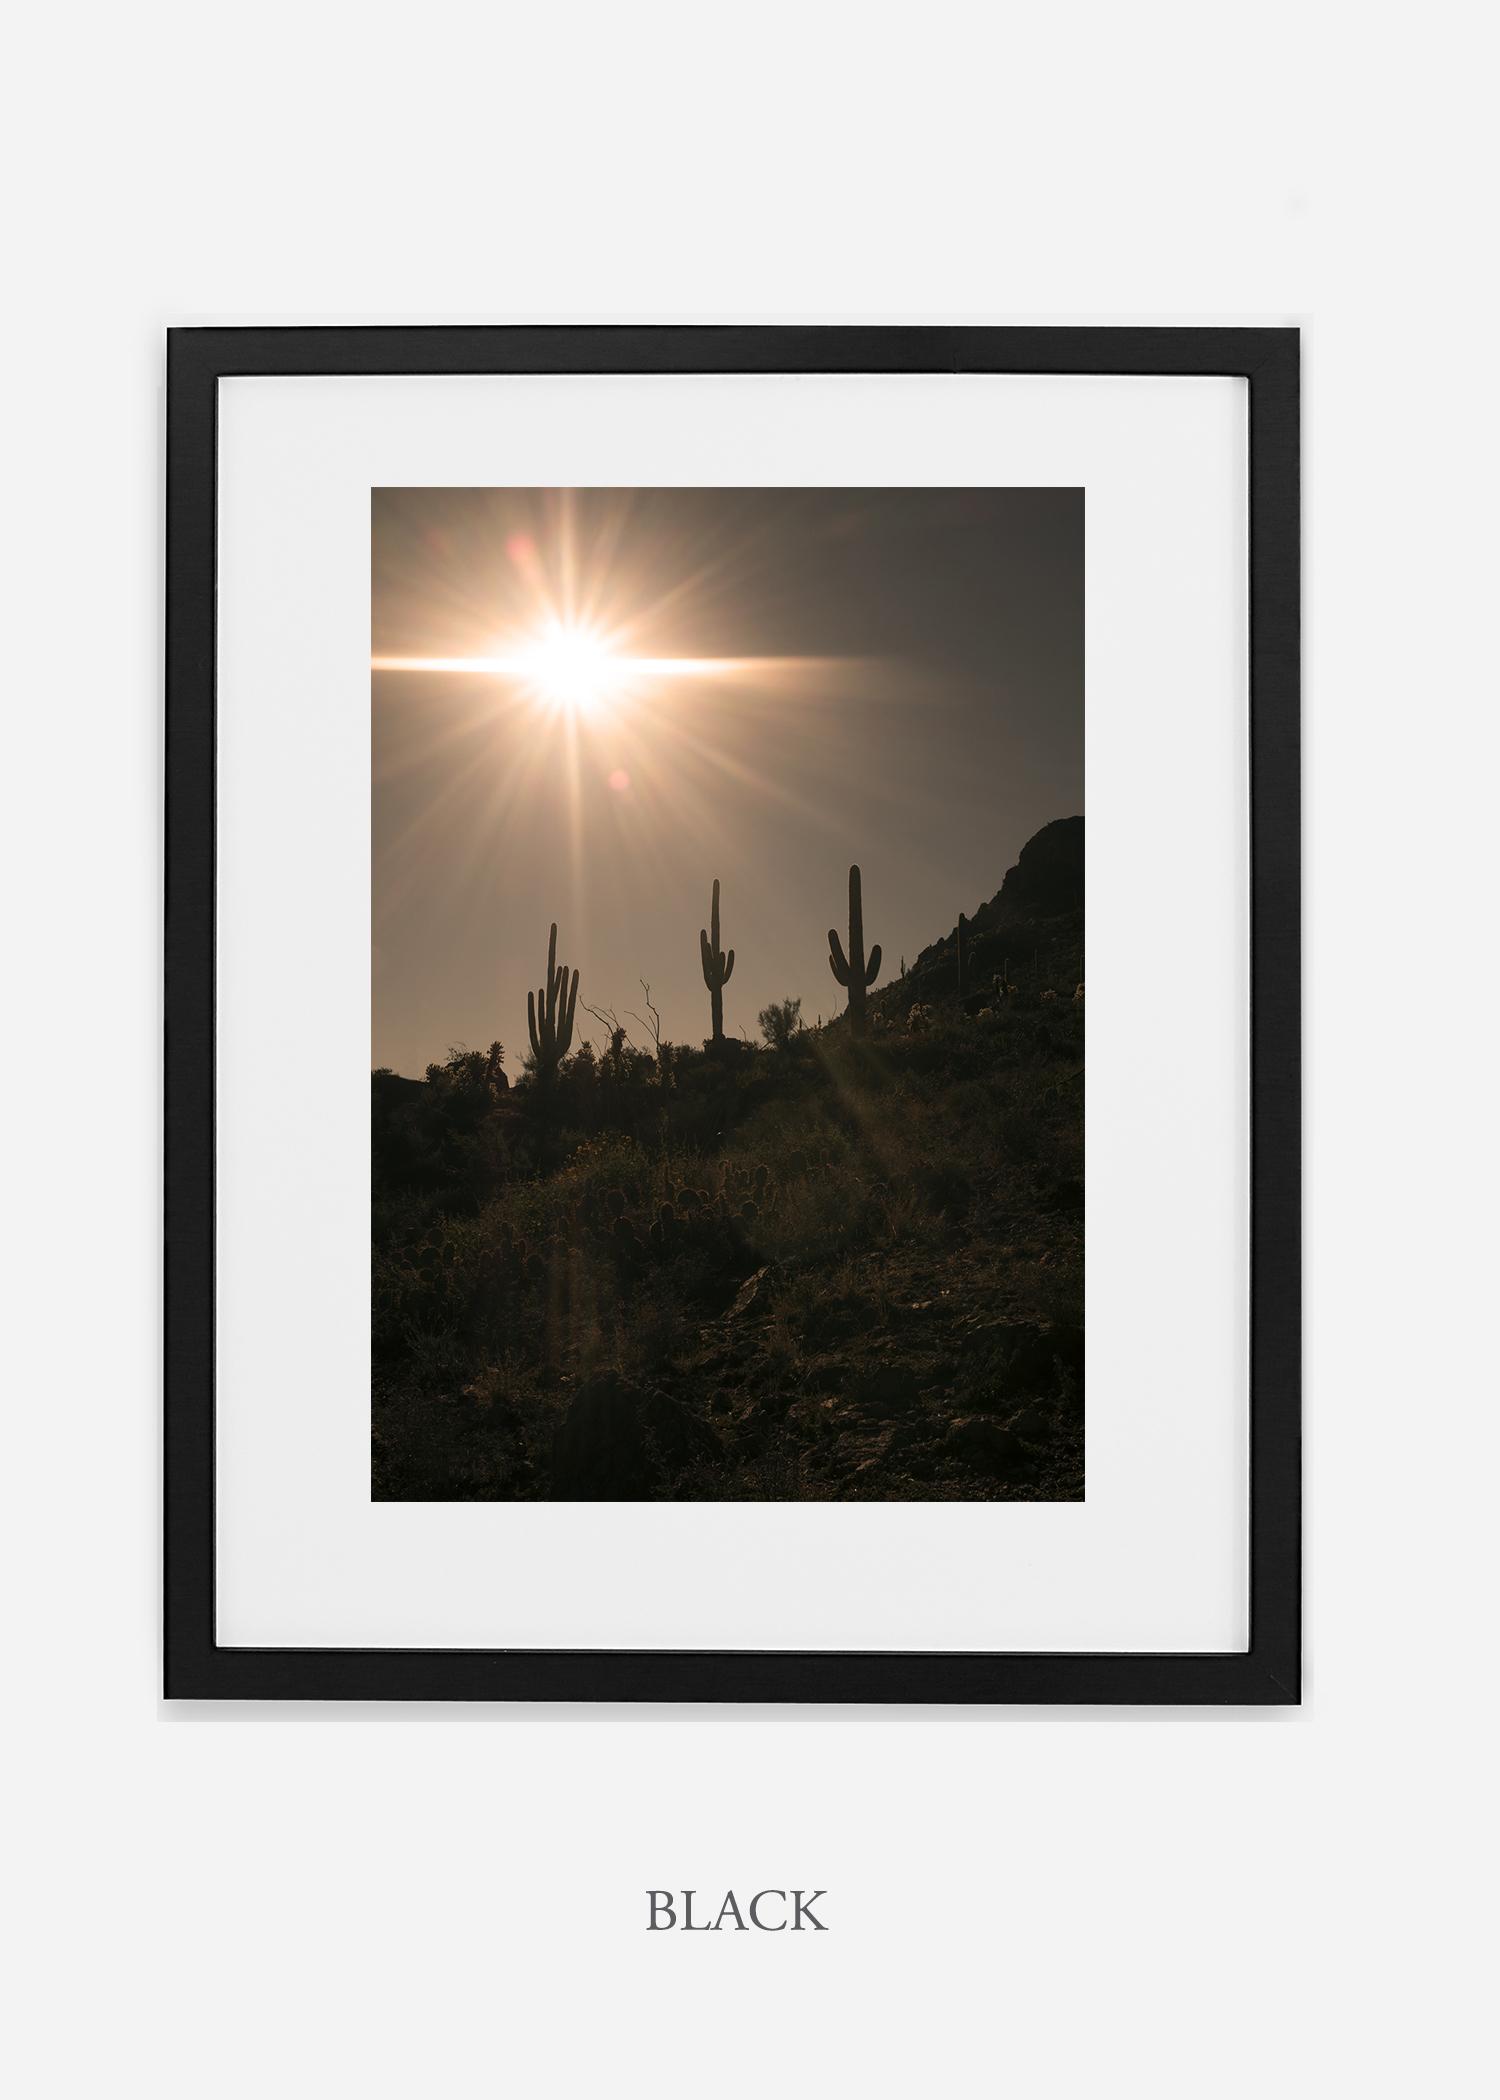 blackframe-saguaroNo.16-wildercalifornia-art-wallart-cactusprint-homedecor-prints-arizona-botanical-artwork-interiordesign.jpg